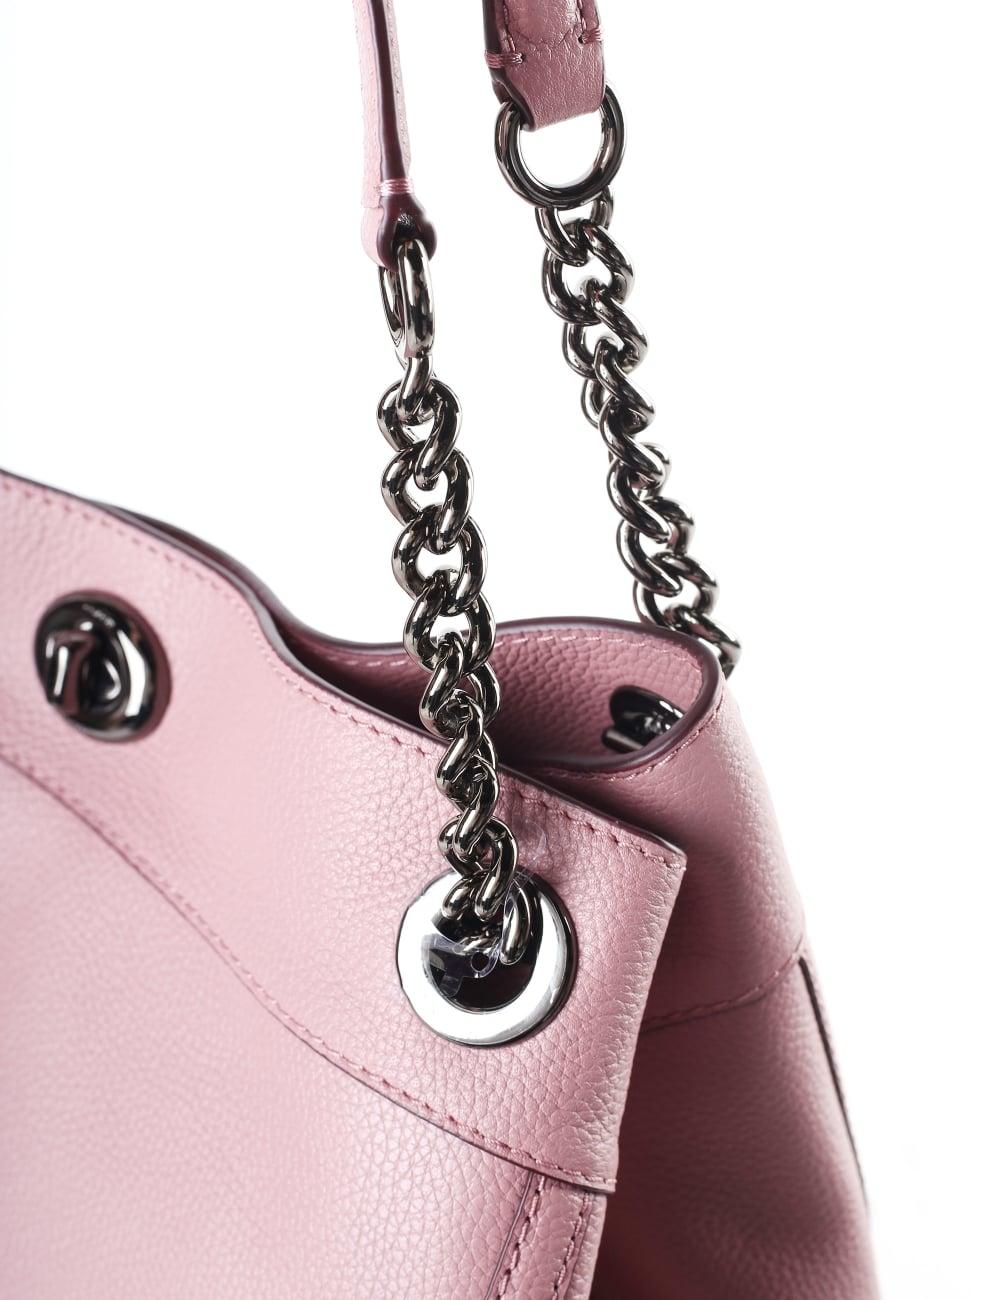 bdb9cfa547d Coach Women s Turnlock Edie Shoulder Bag